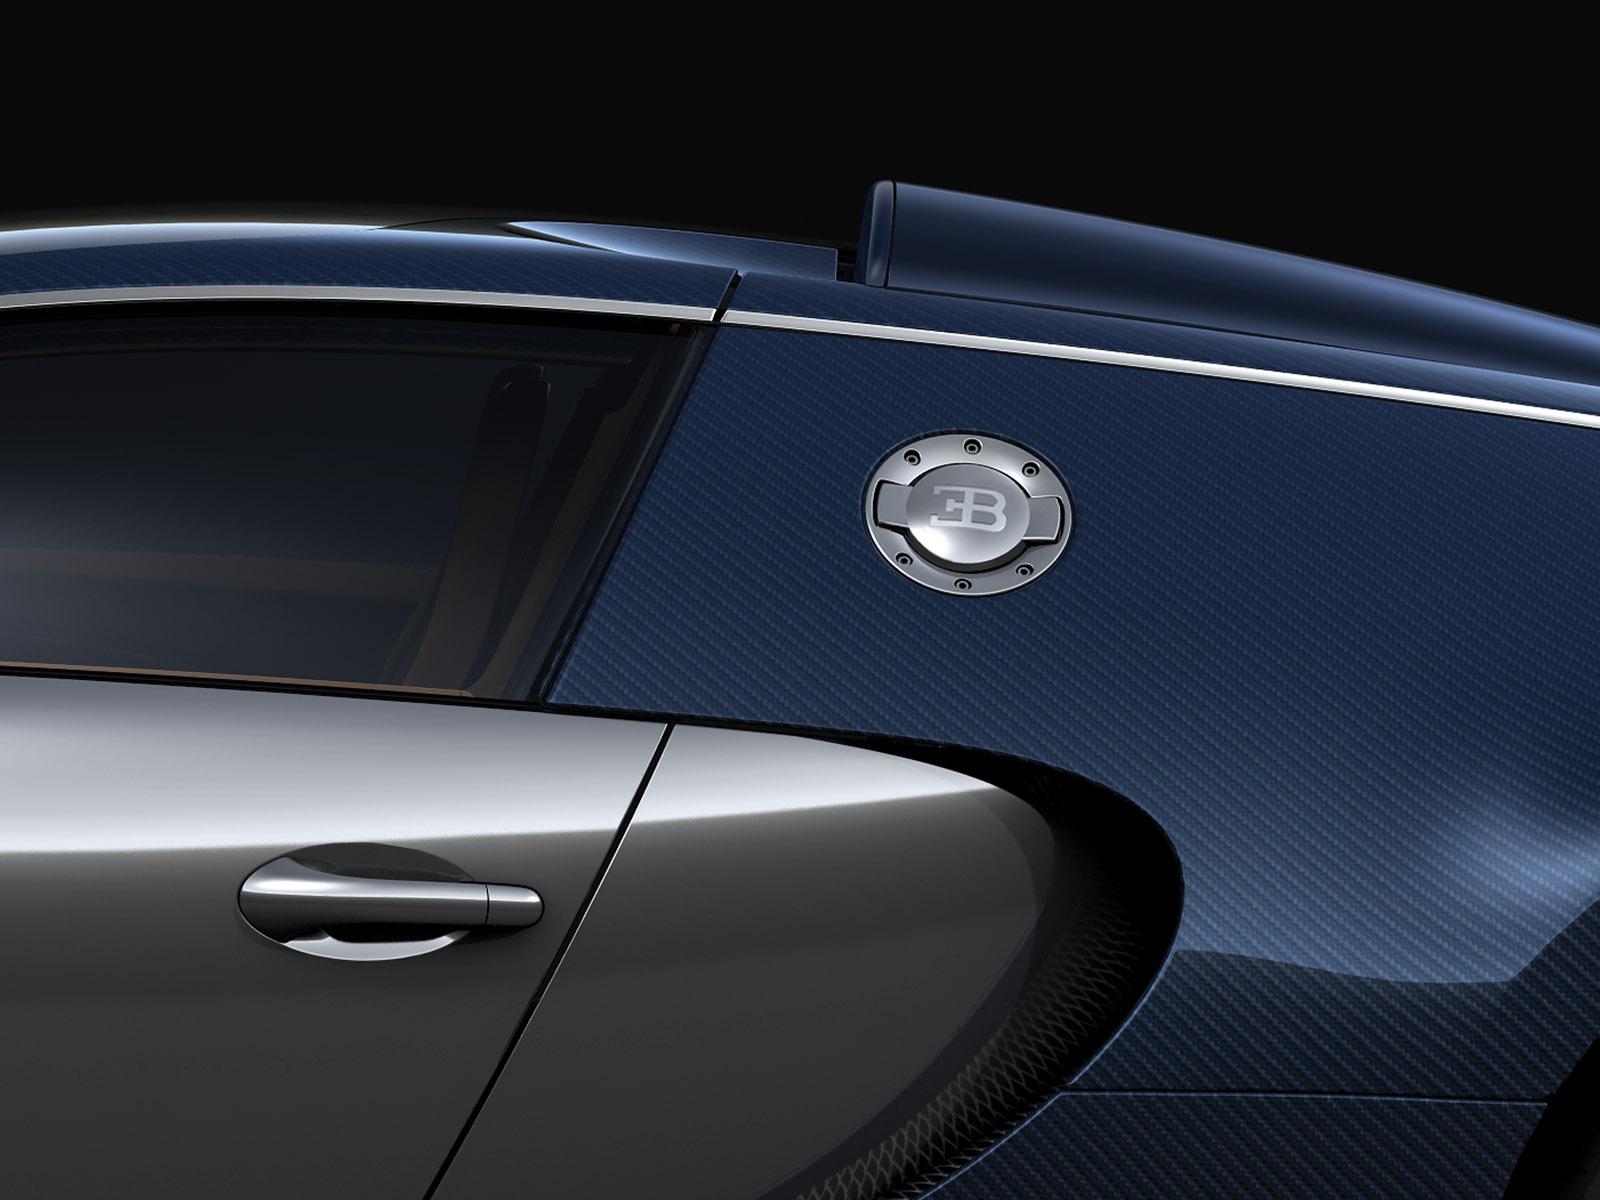 bugatti-sang-bleu-05 Gorgeous Bugatti Veyron Grand Sport Vitesse Bleu Cars Trend